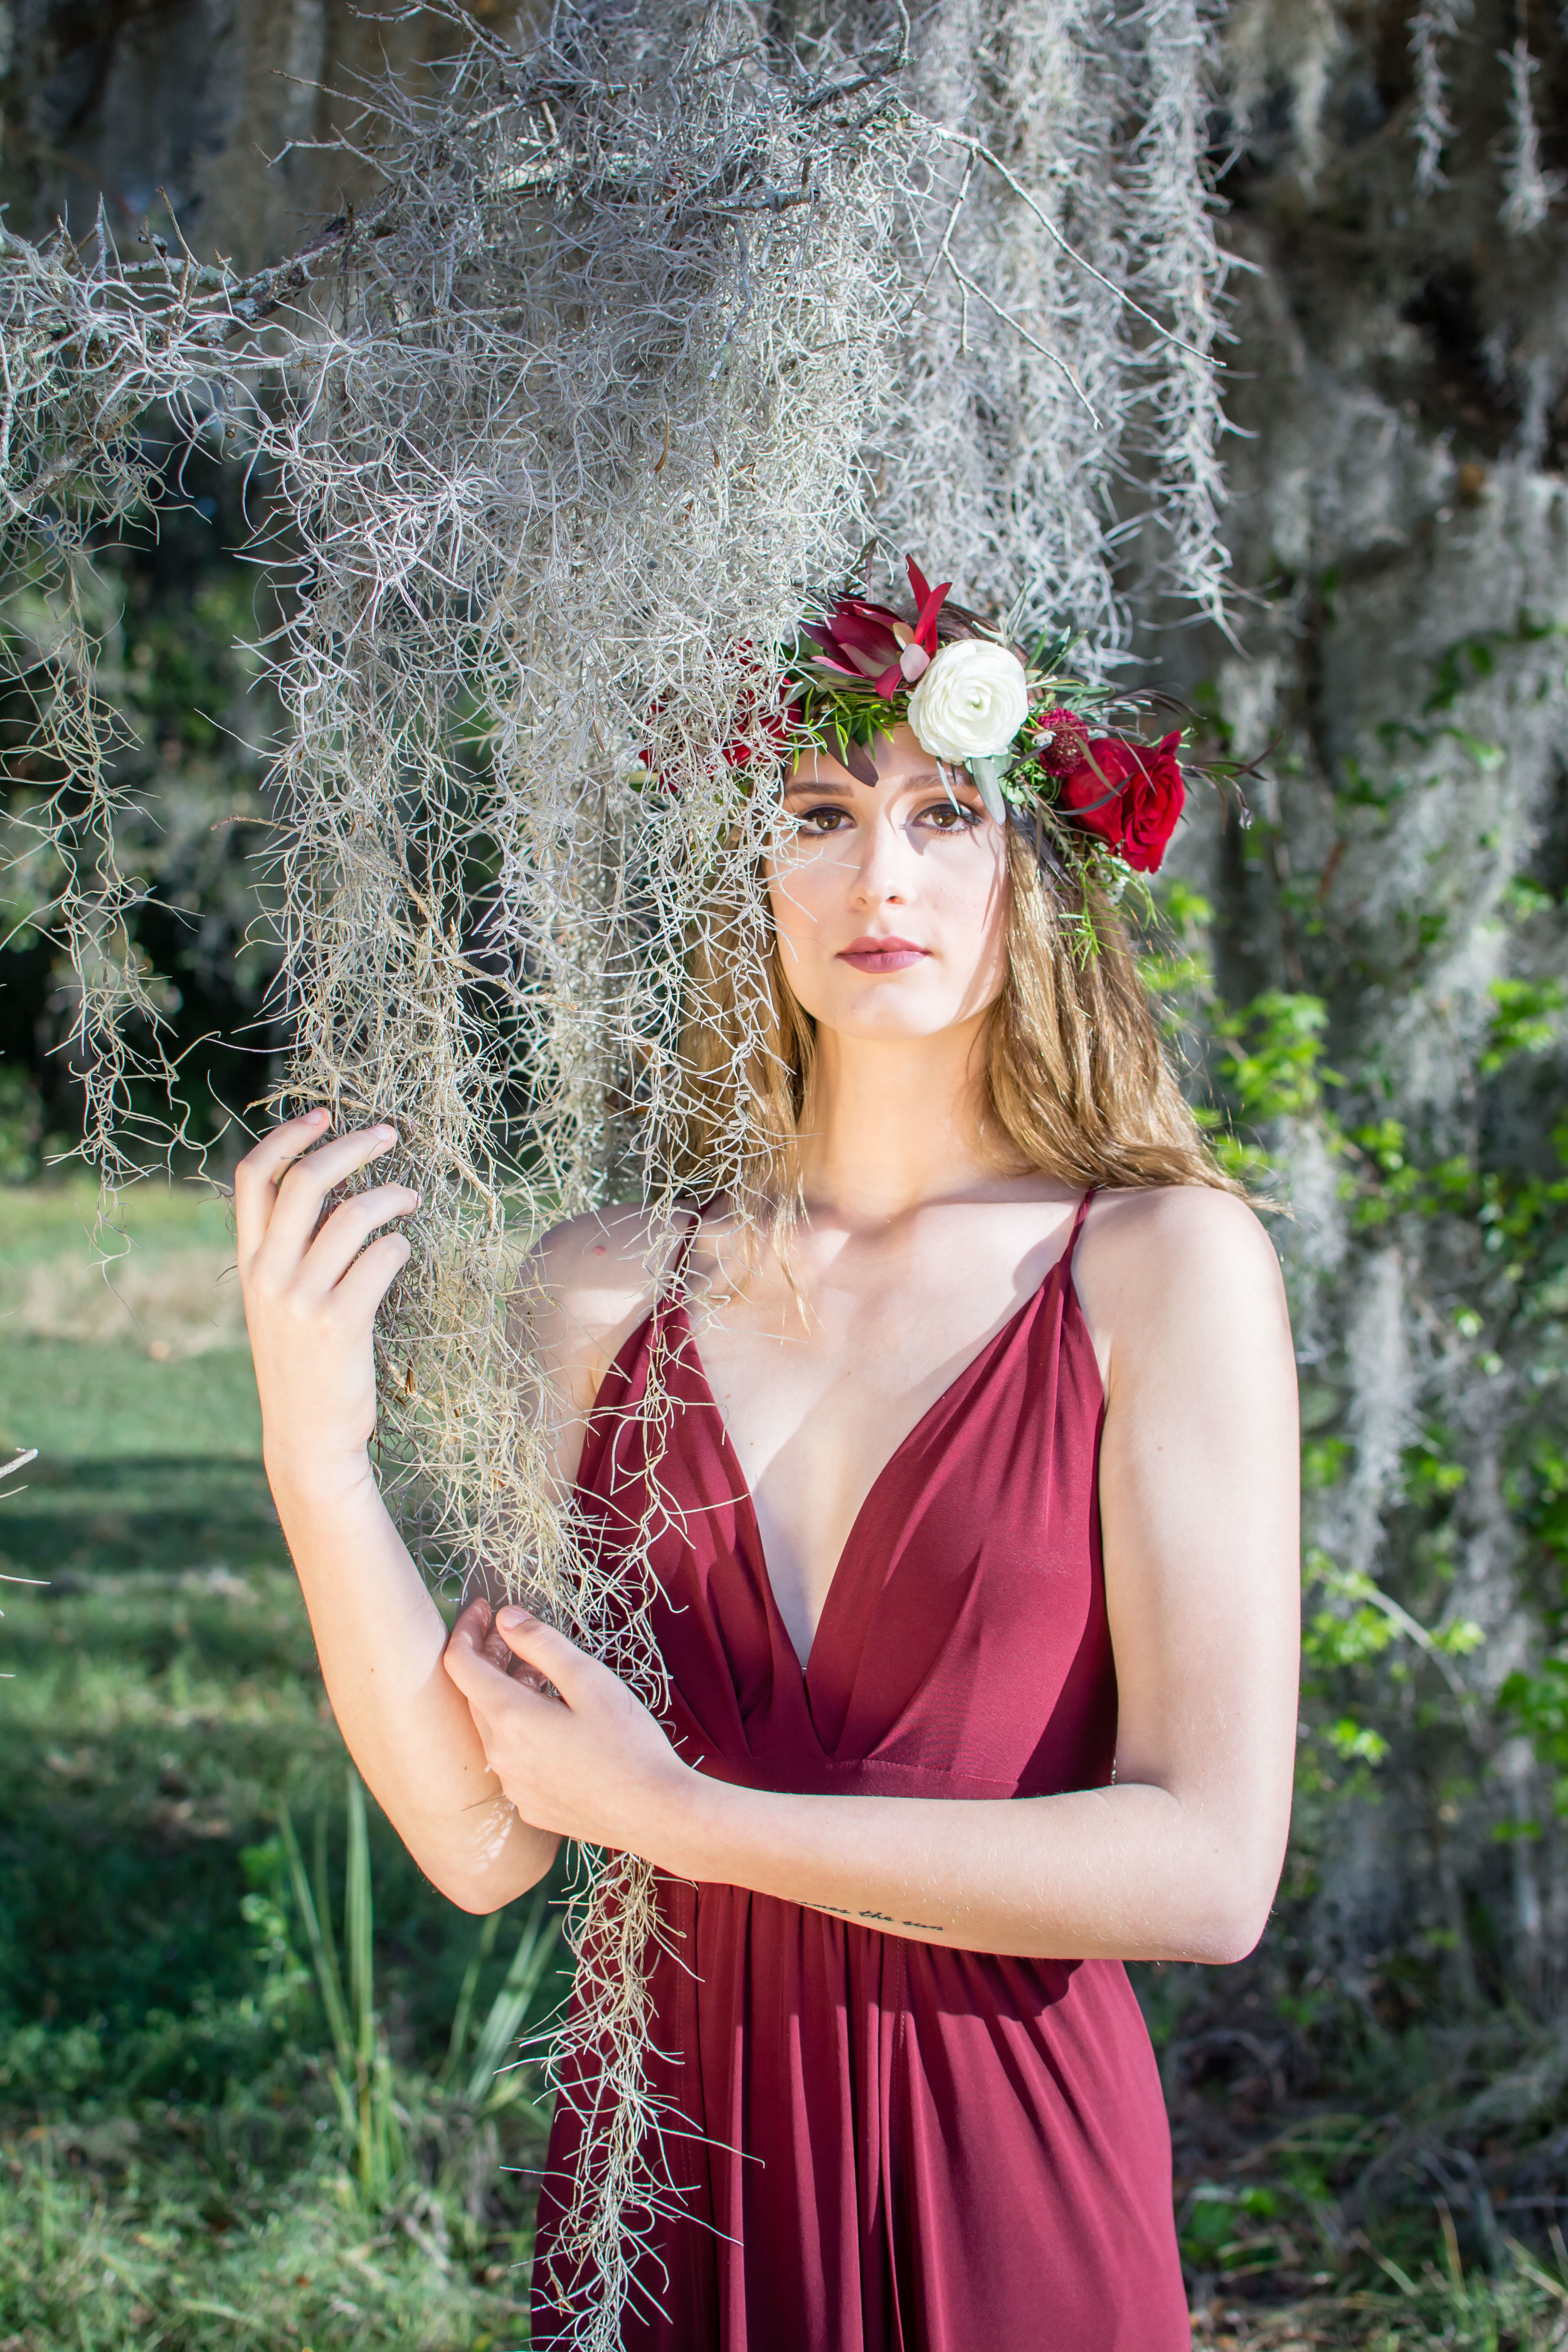 whimsical-bridal-inspiration-fashion-photoshoot-geneva-photographer-yanitza-ninett-16.jpg